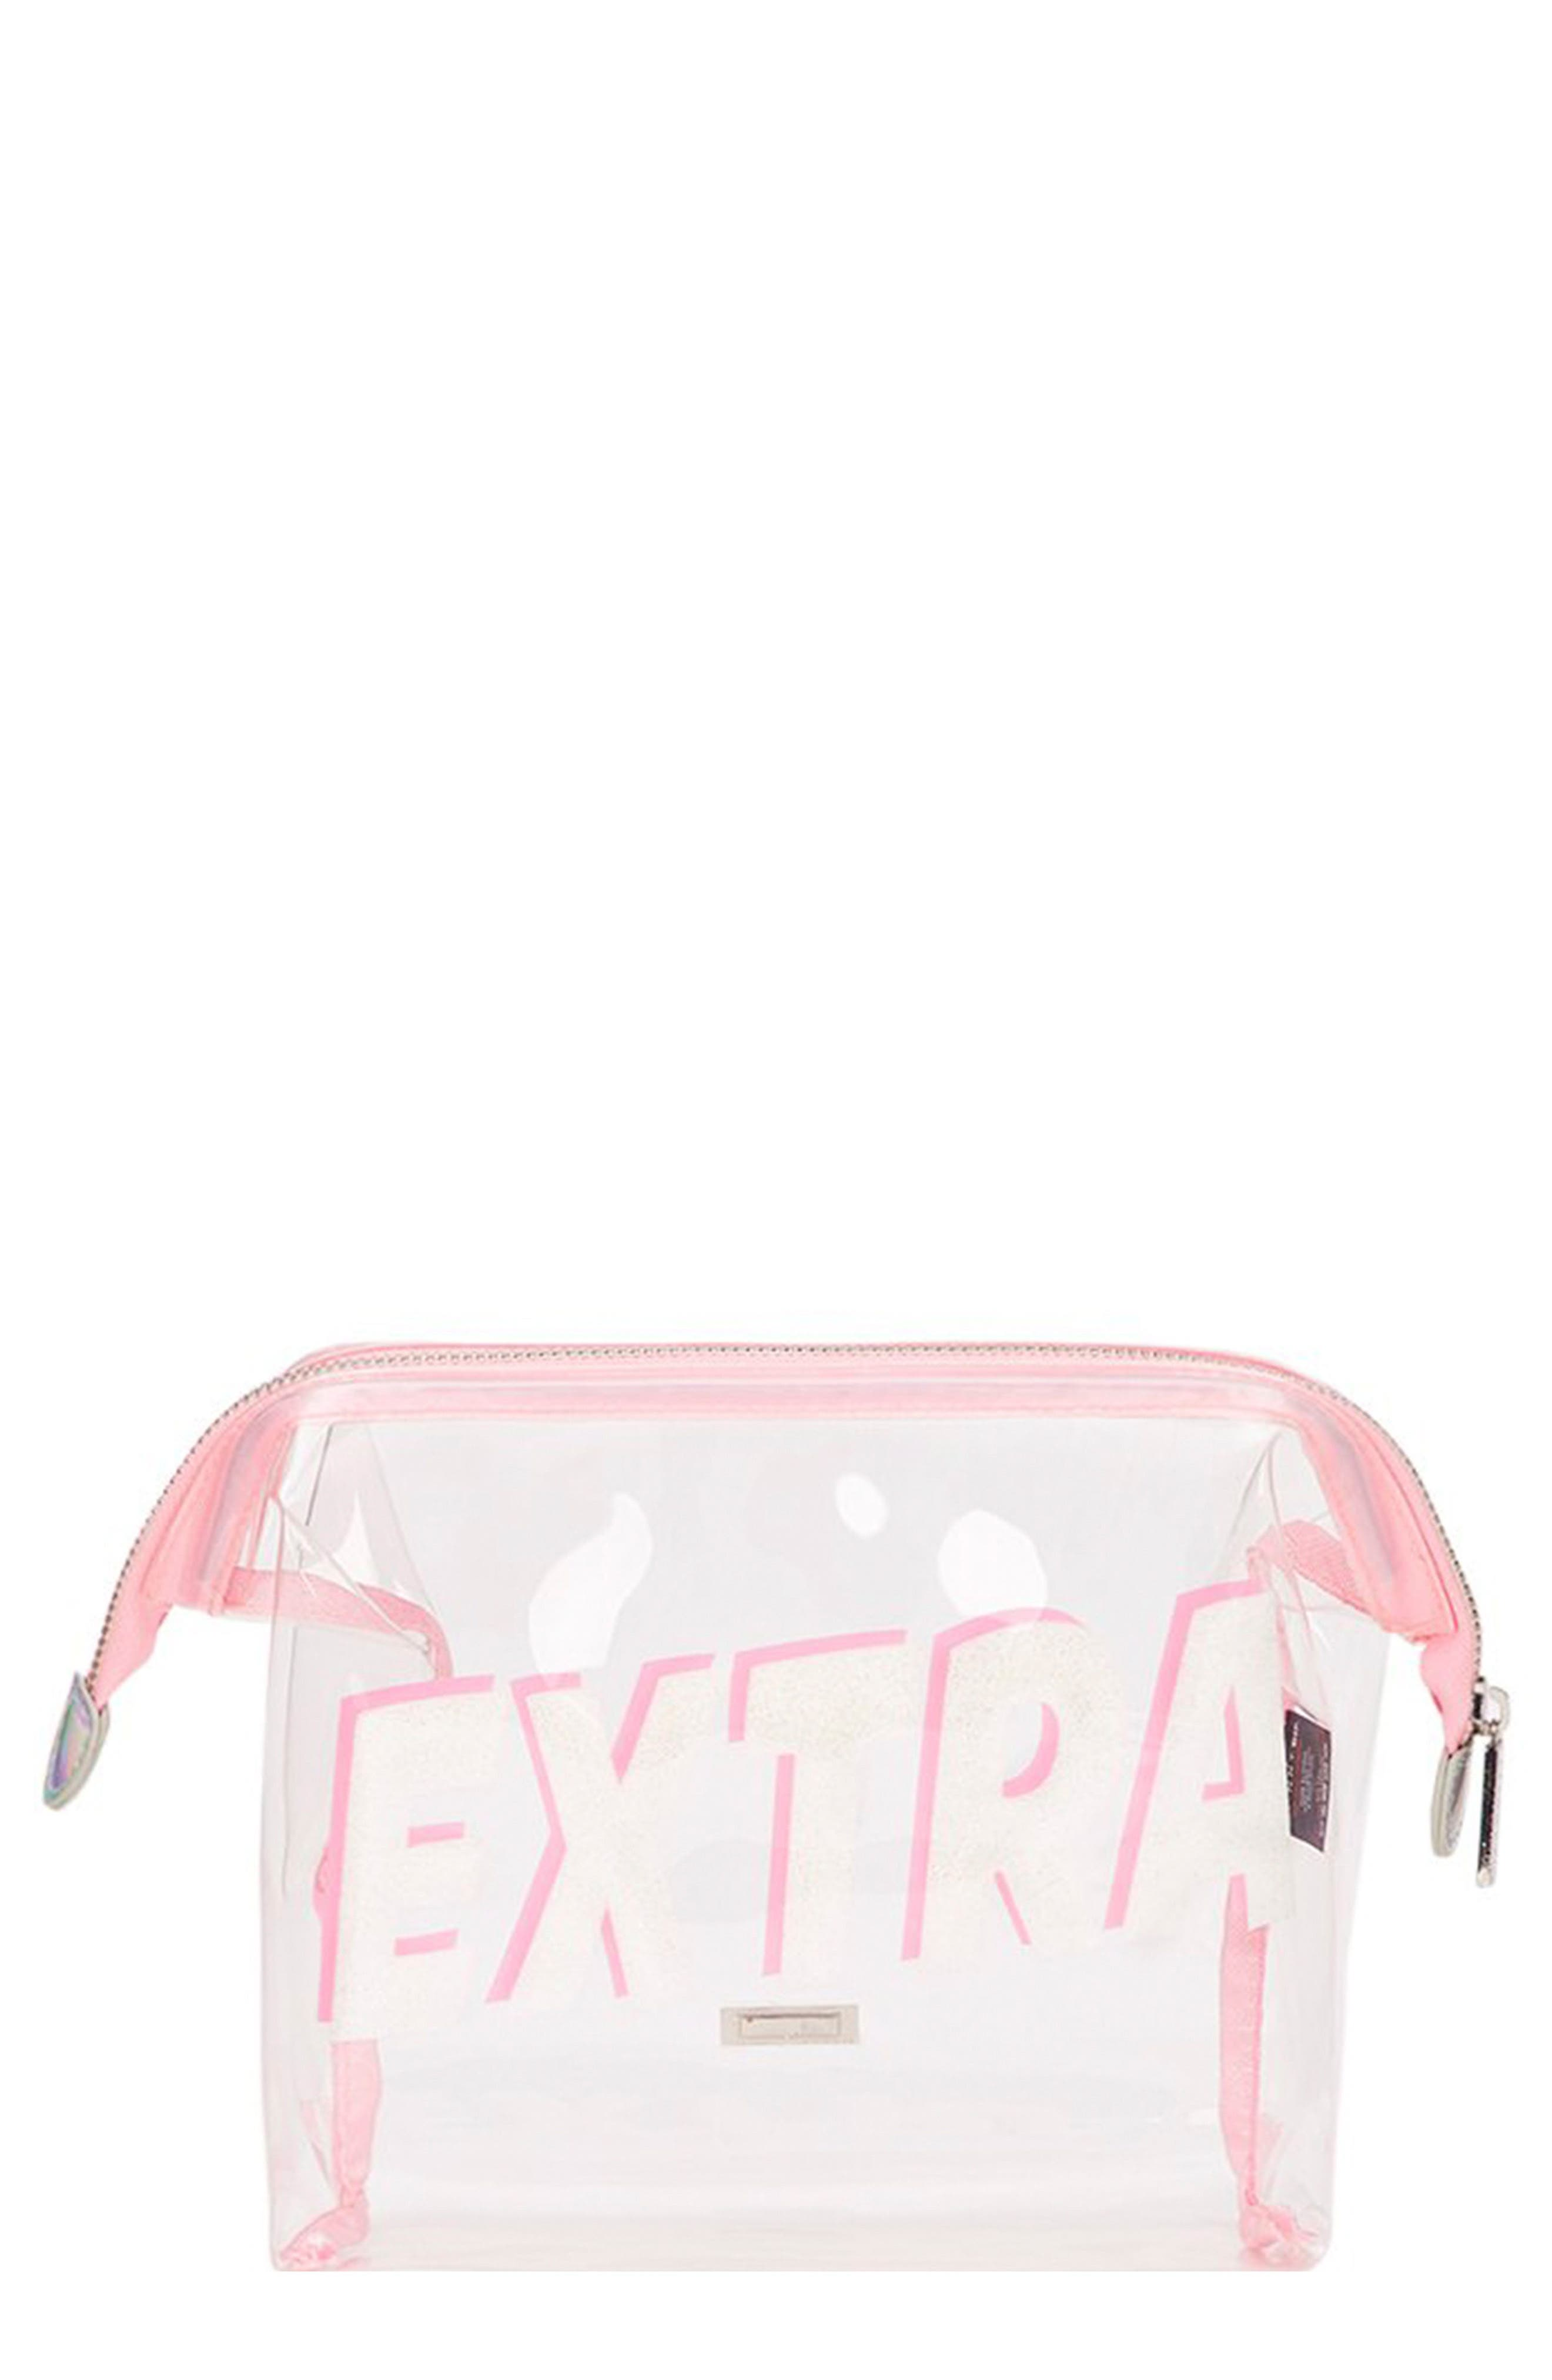 Skinny Dip Extra Makeup Bag,                             Main thumbnail 1, color,                             No Color